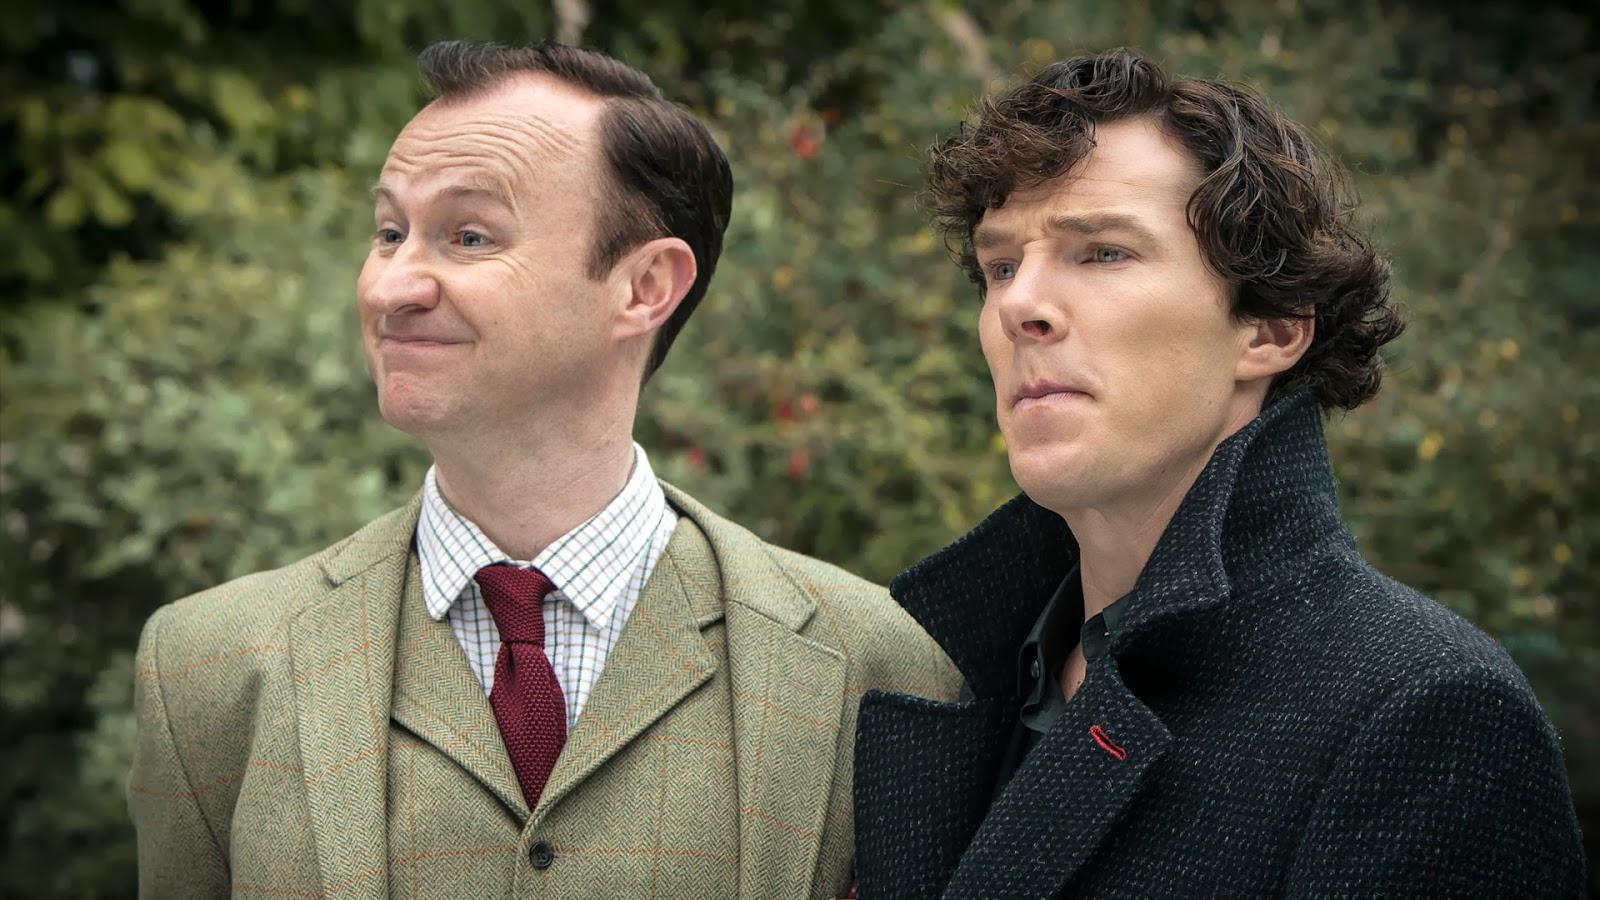 Benedict Cumberbatch and Mark Gatiss as Sherlock and Mycroft Holmes in BBC Sherlock Season 3 Episode 3 His Last Vow